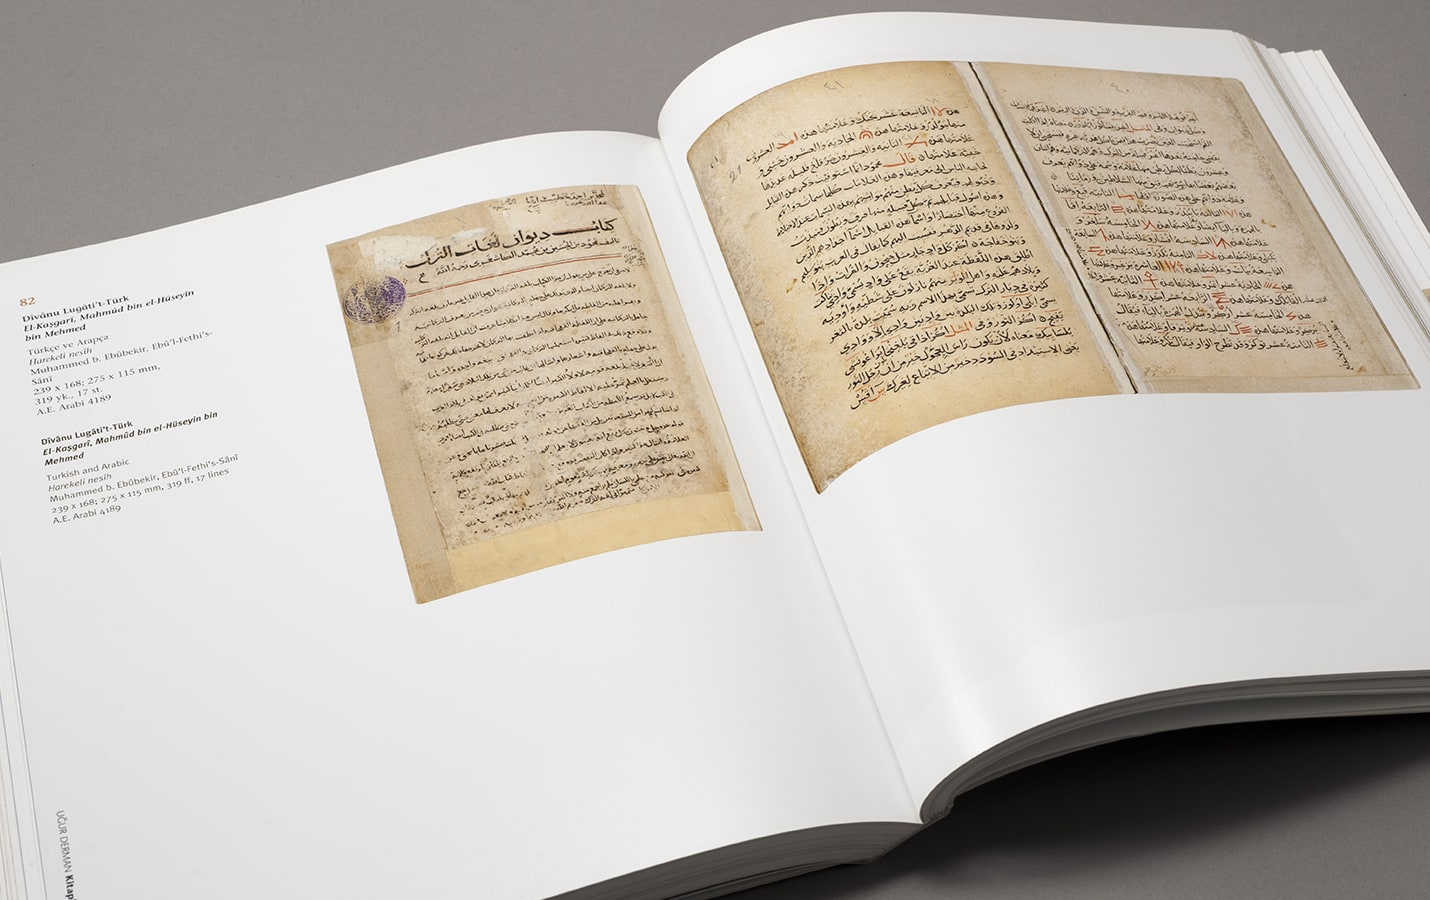 Ali Emiri Efendi and His World